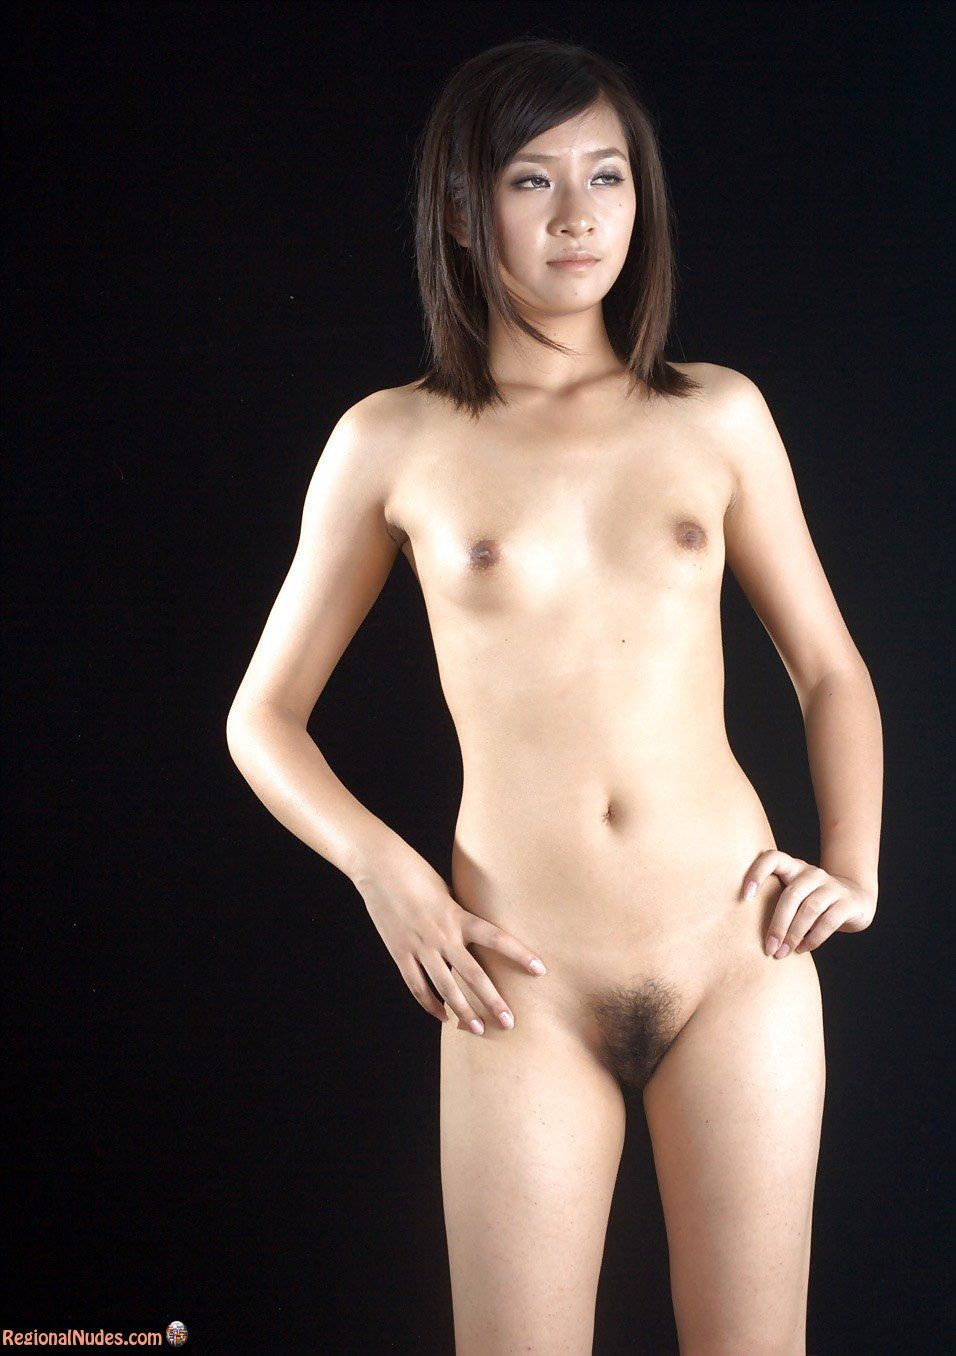 Naked man i love you